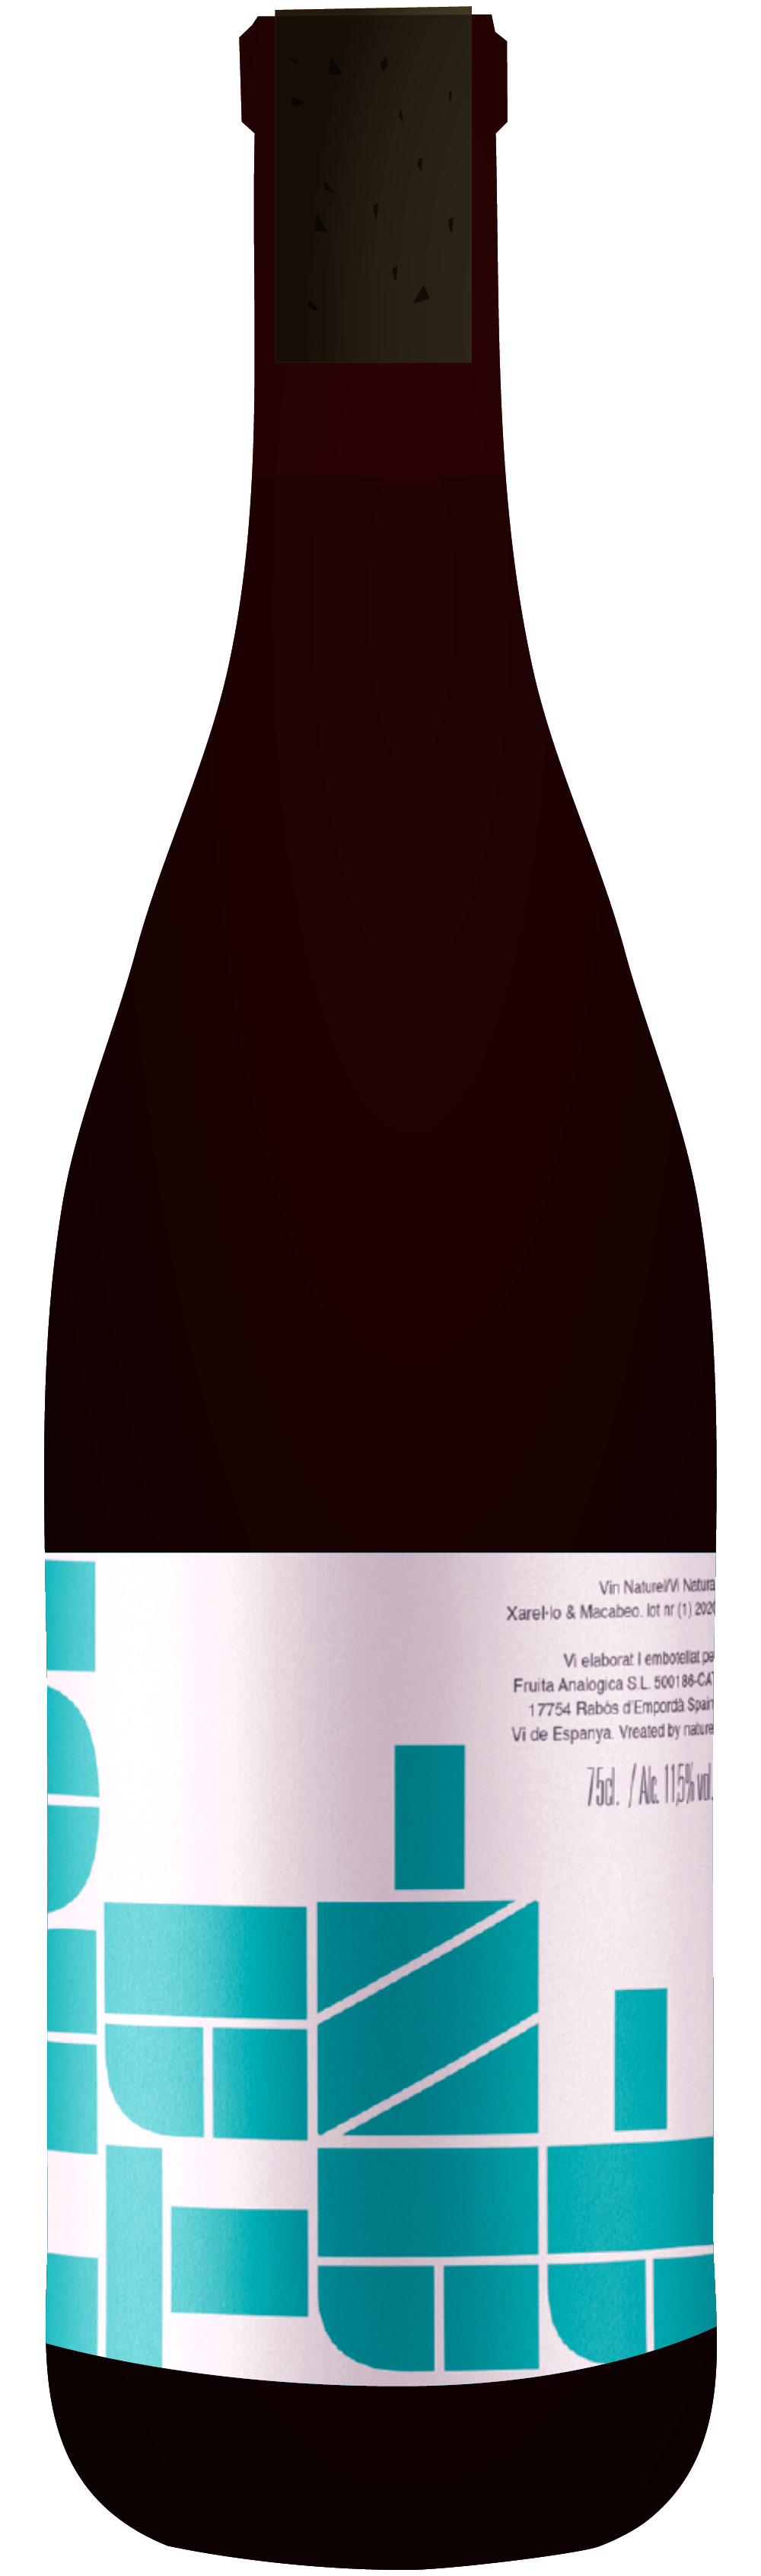 tnwc_bottles_20215